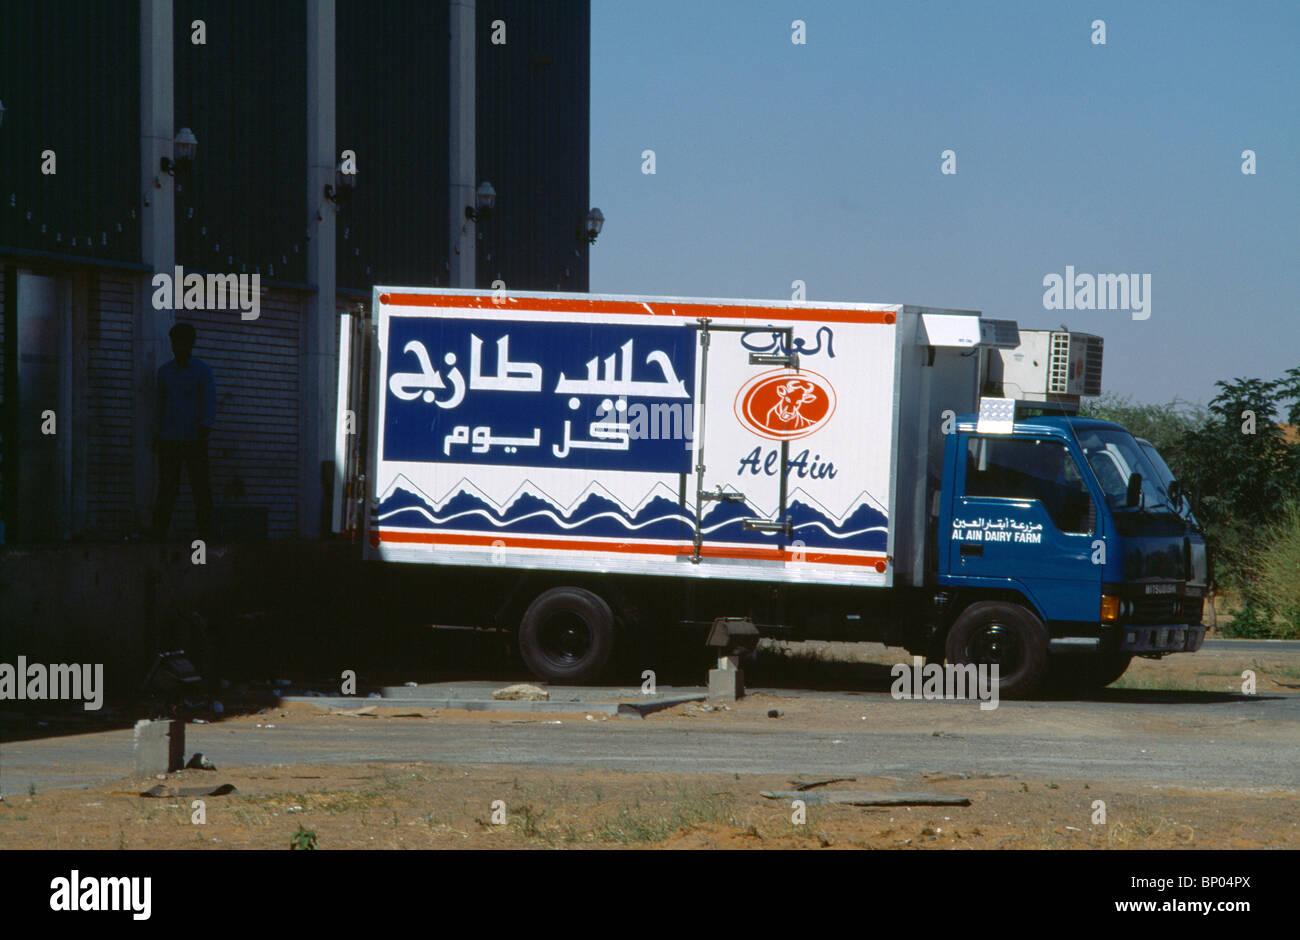 Al Ain Poultry Farm